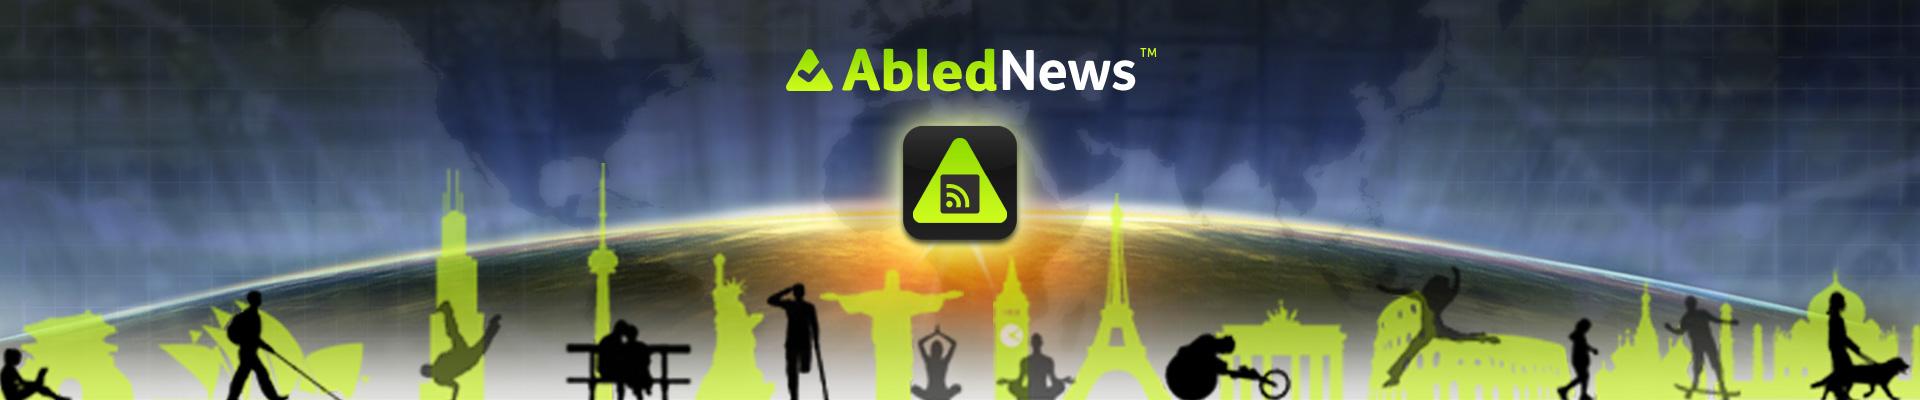 AbledNews Banner